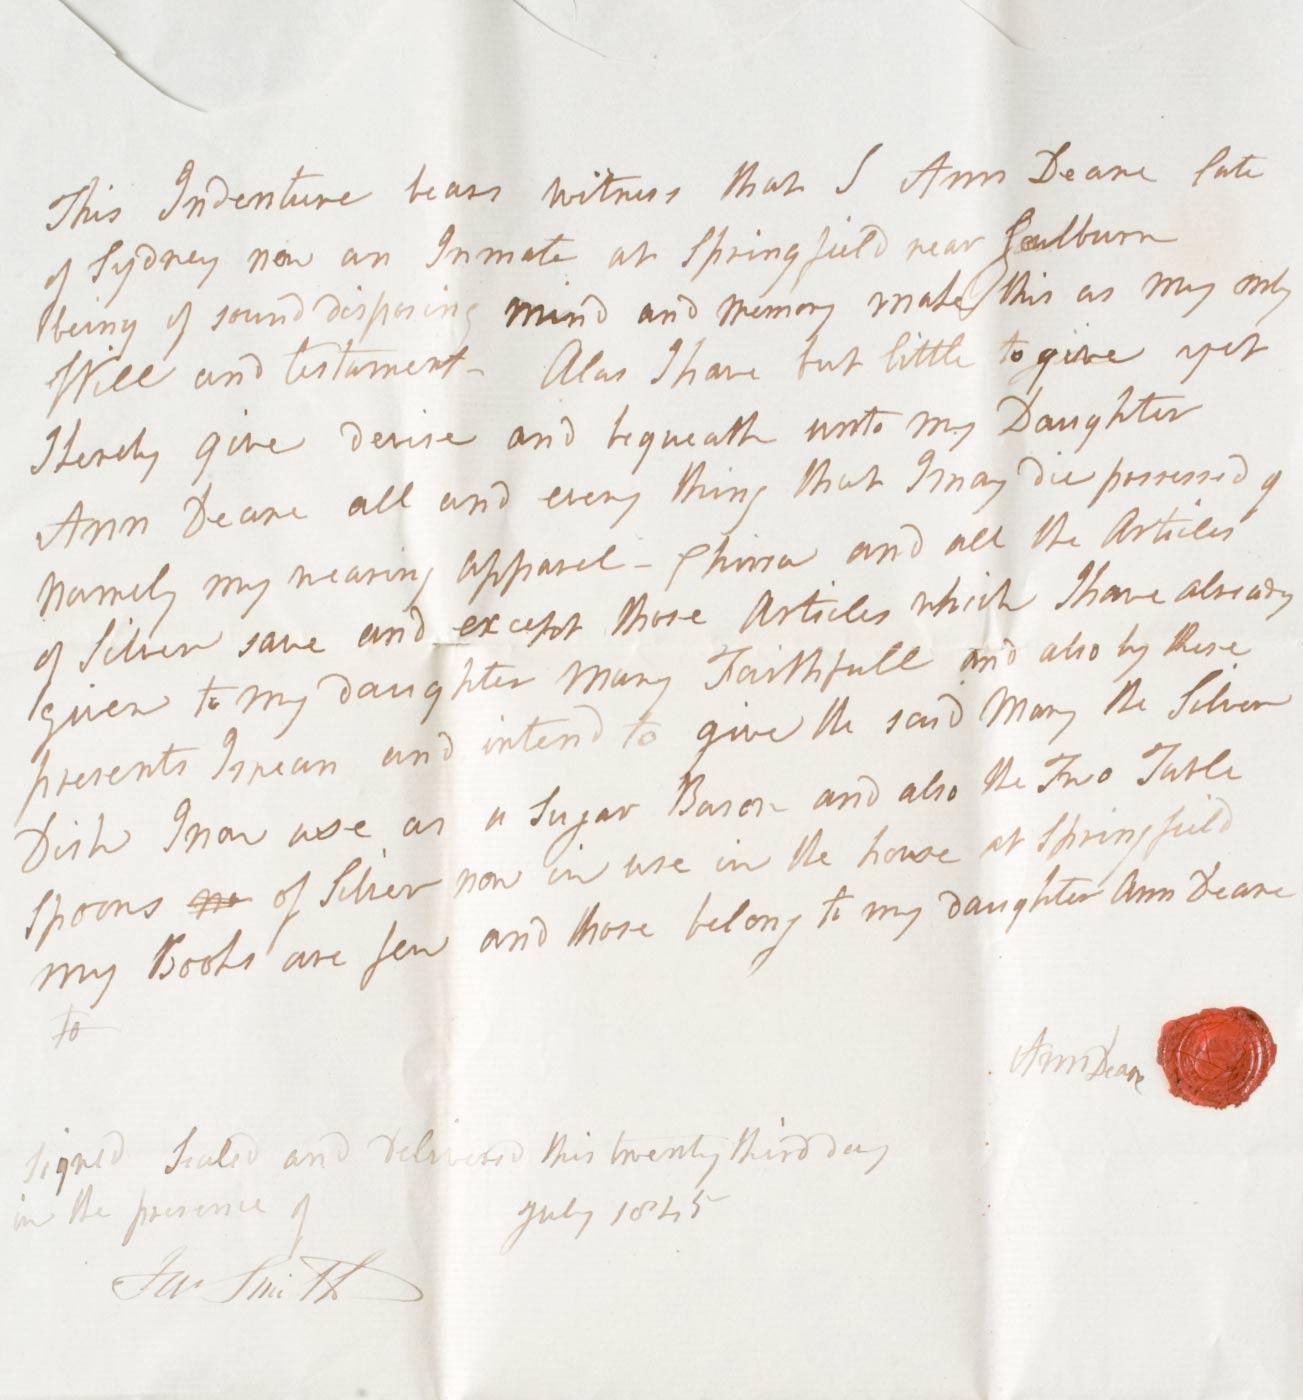 Ann Deane's handwritten will, July 1845.